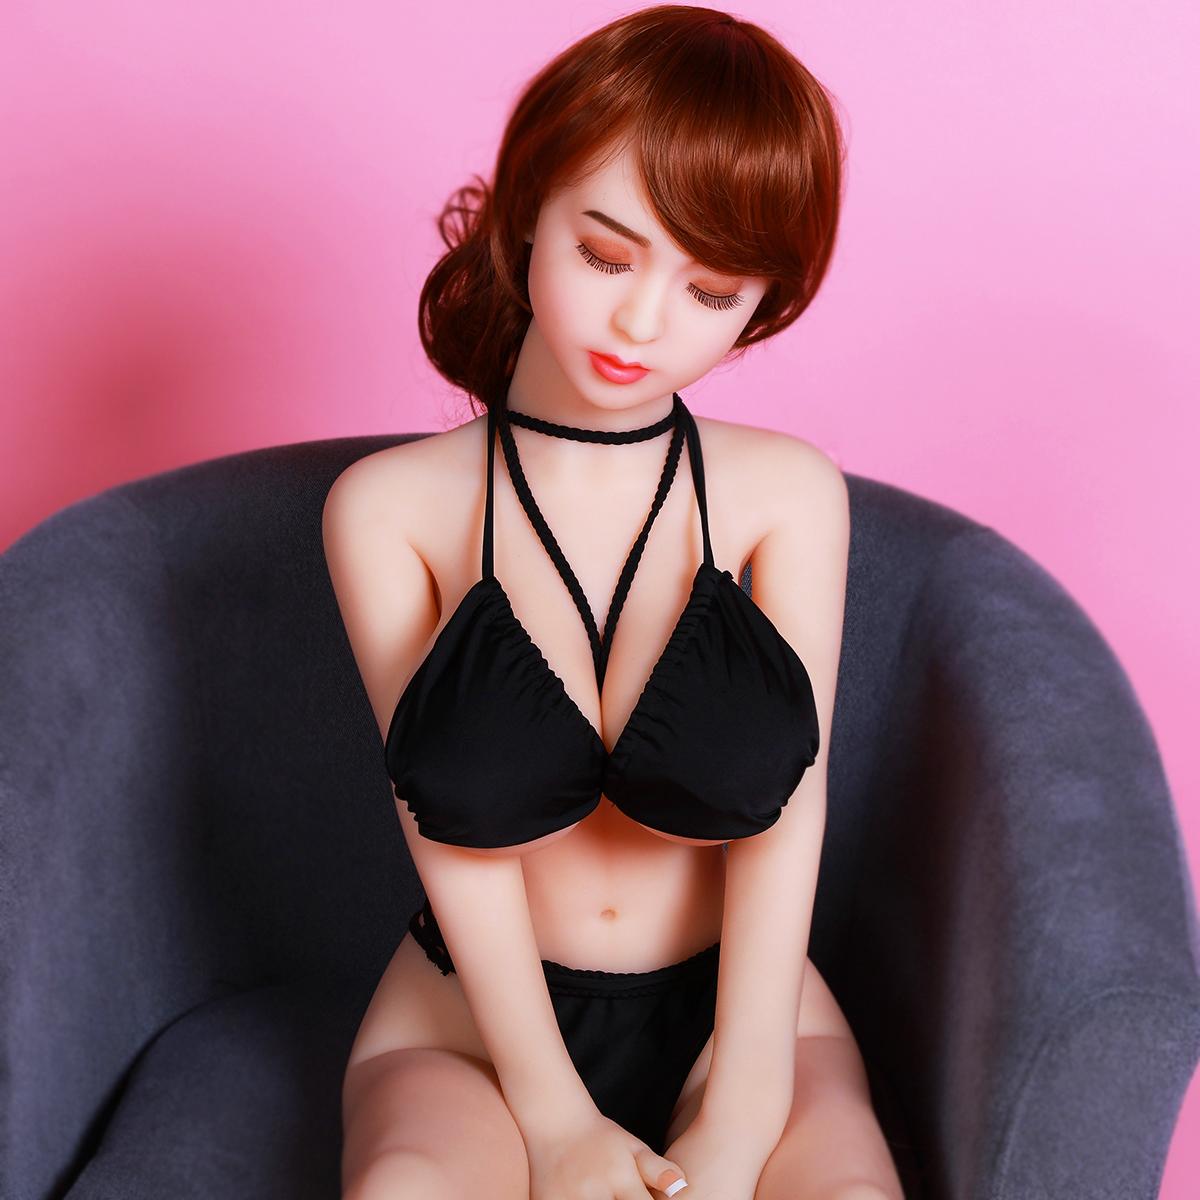 Sexpop Bibi